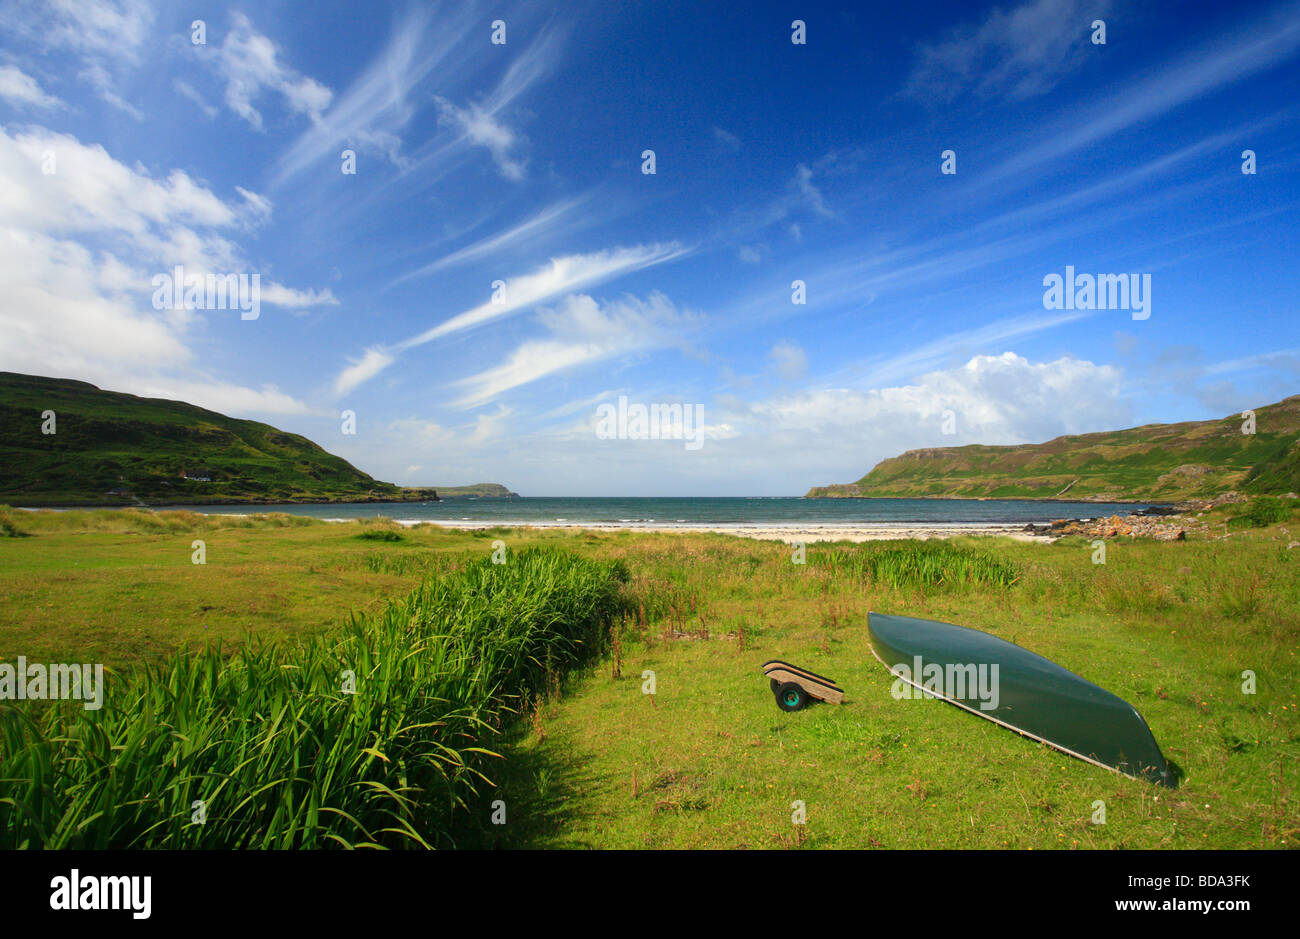 Calgary Bay on the Isle of Mull, Scotland. - Stock Image